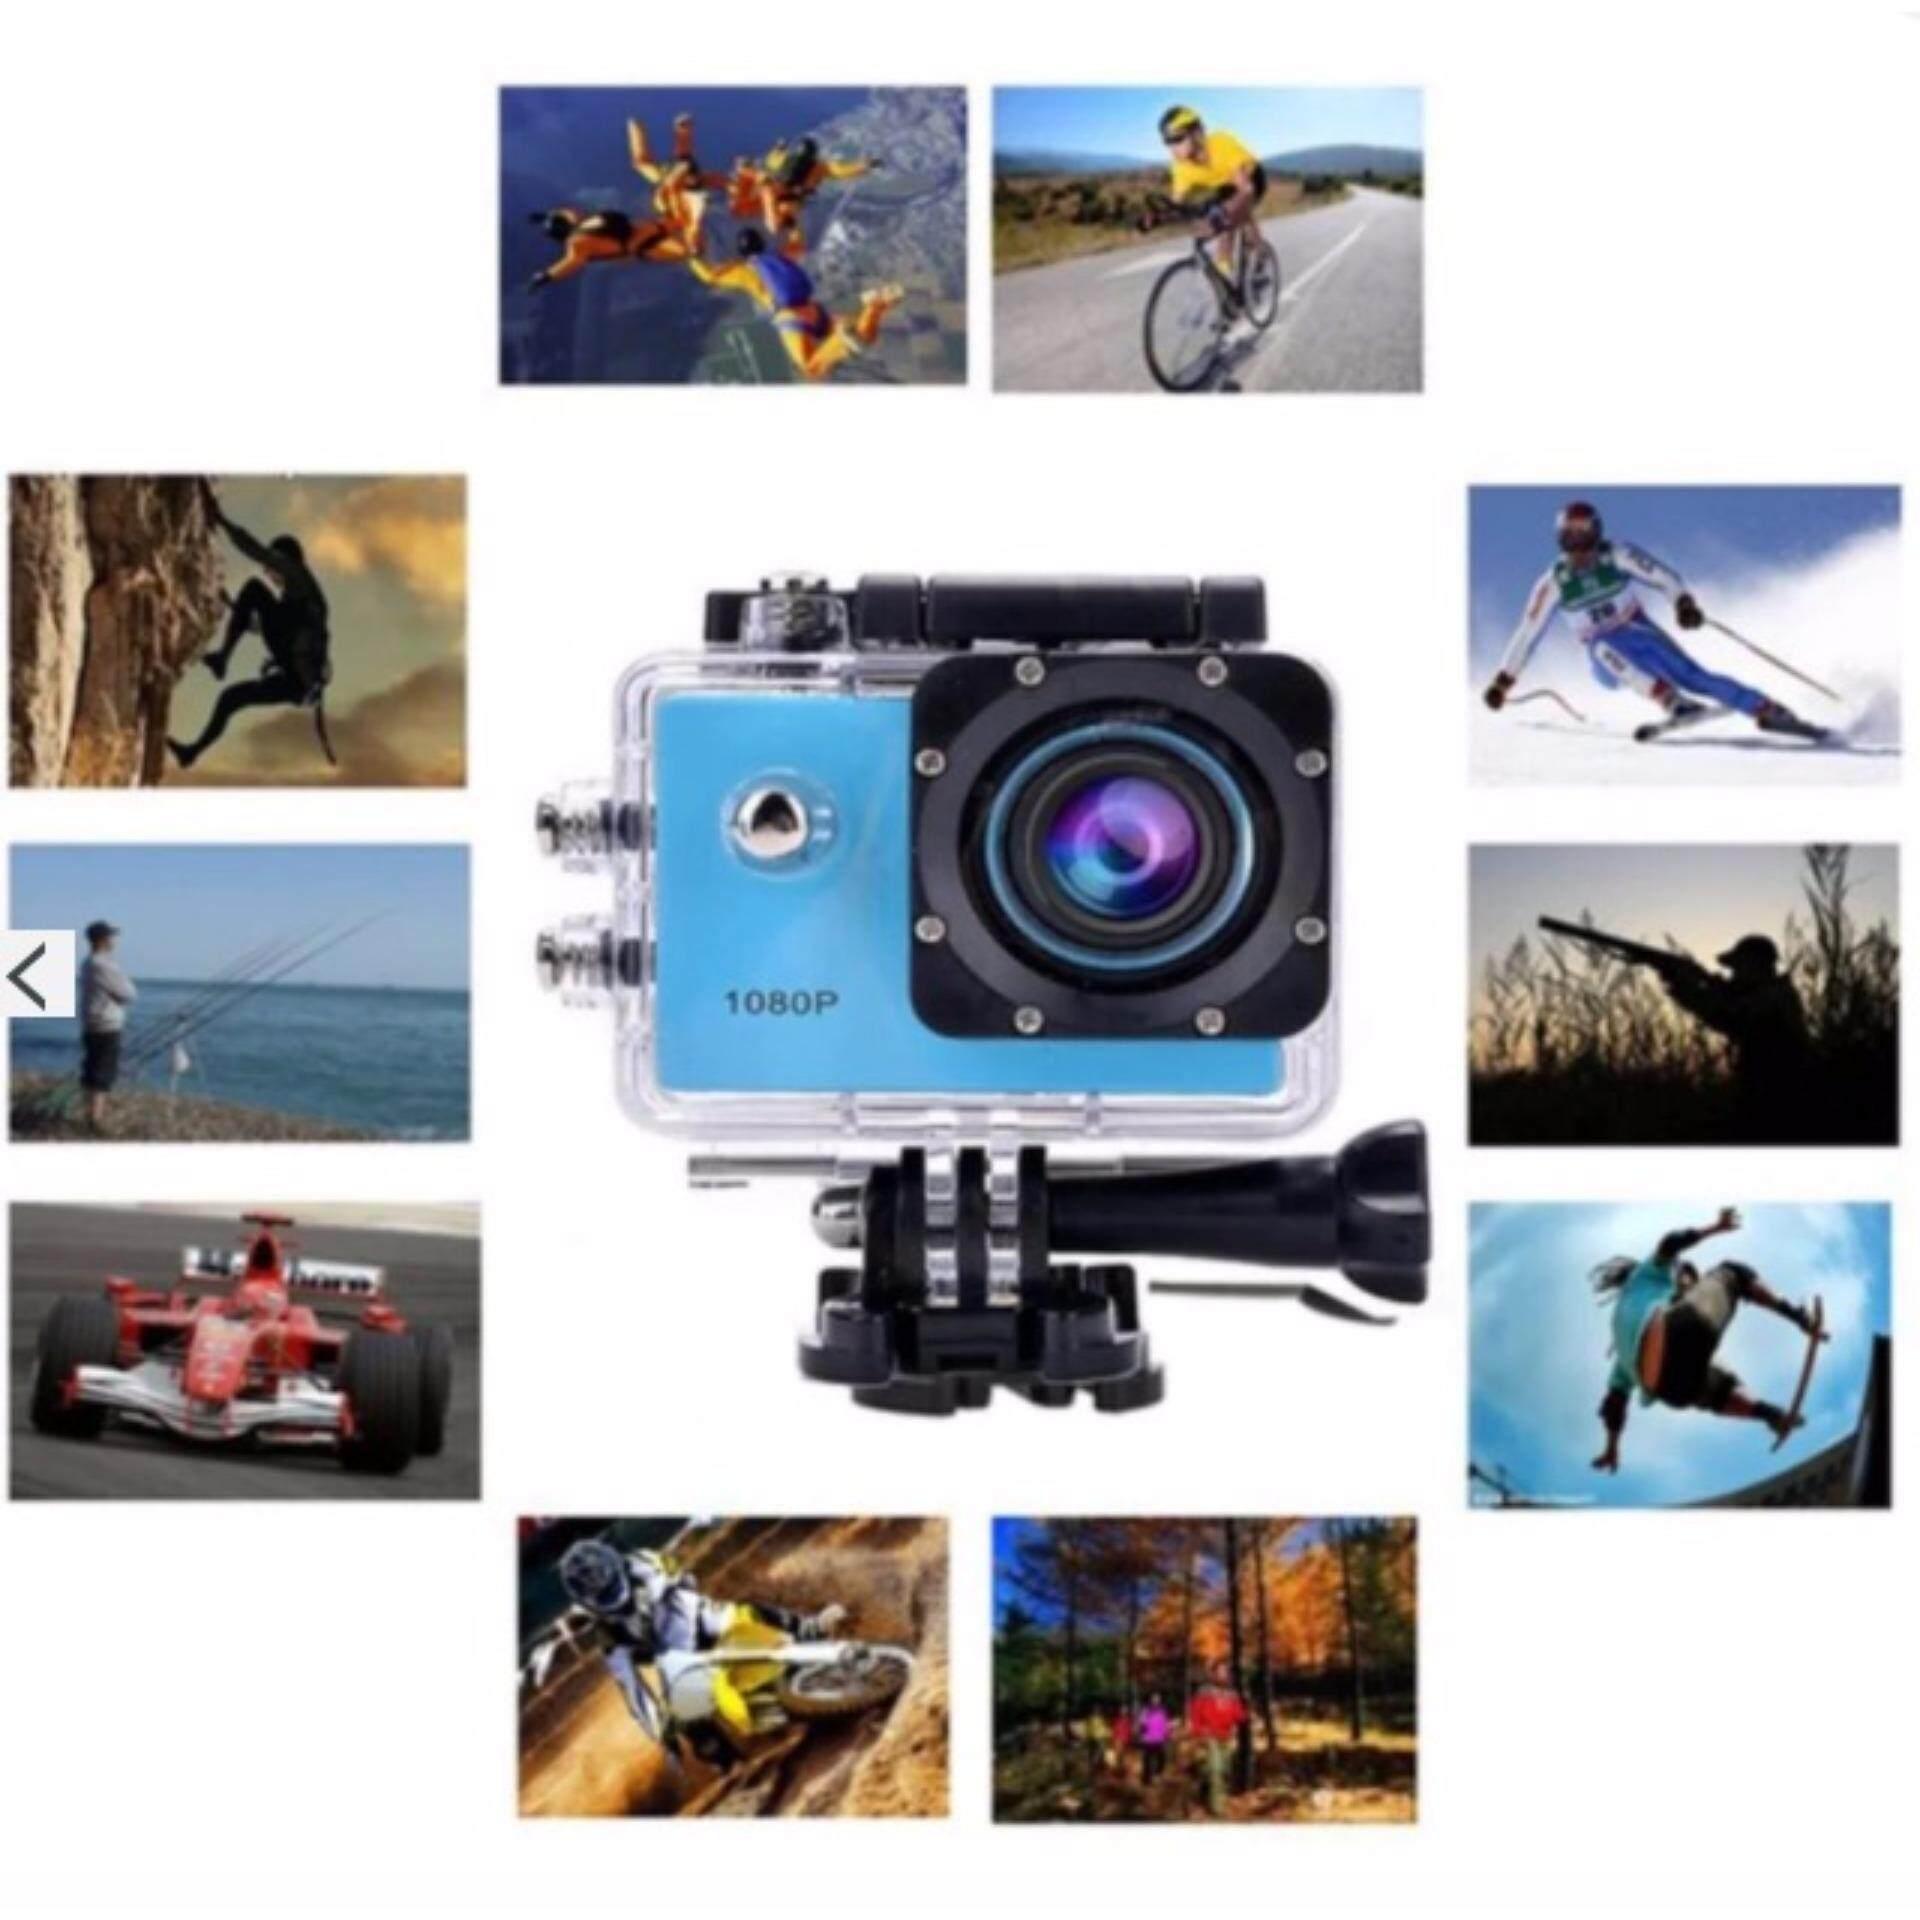 GD MOBILE Action Camera กล้องกันน้ำ 2.0 HD DV 1080p Sports Camera No Wifi JX 100% ของแท้เท่านั้น